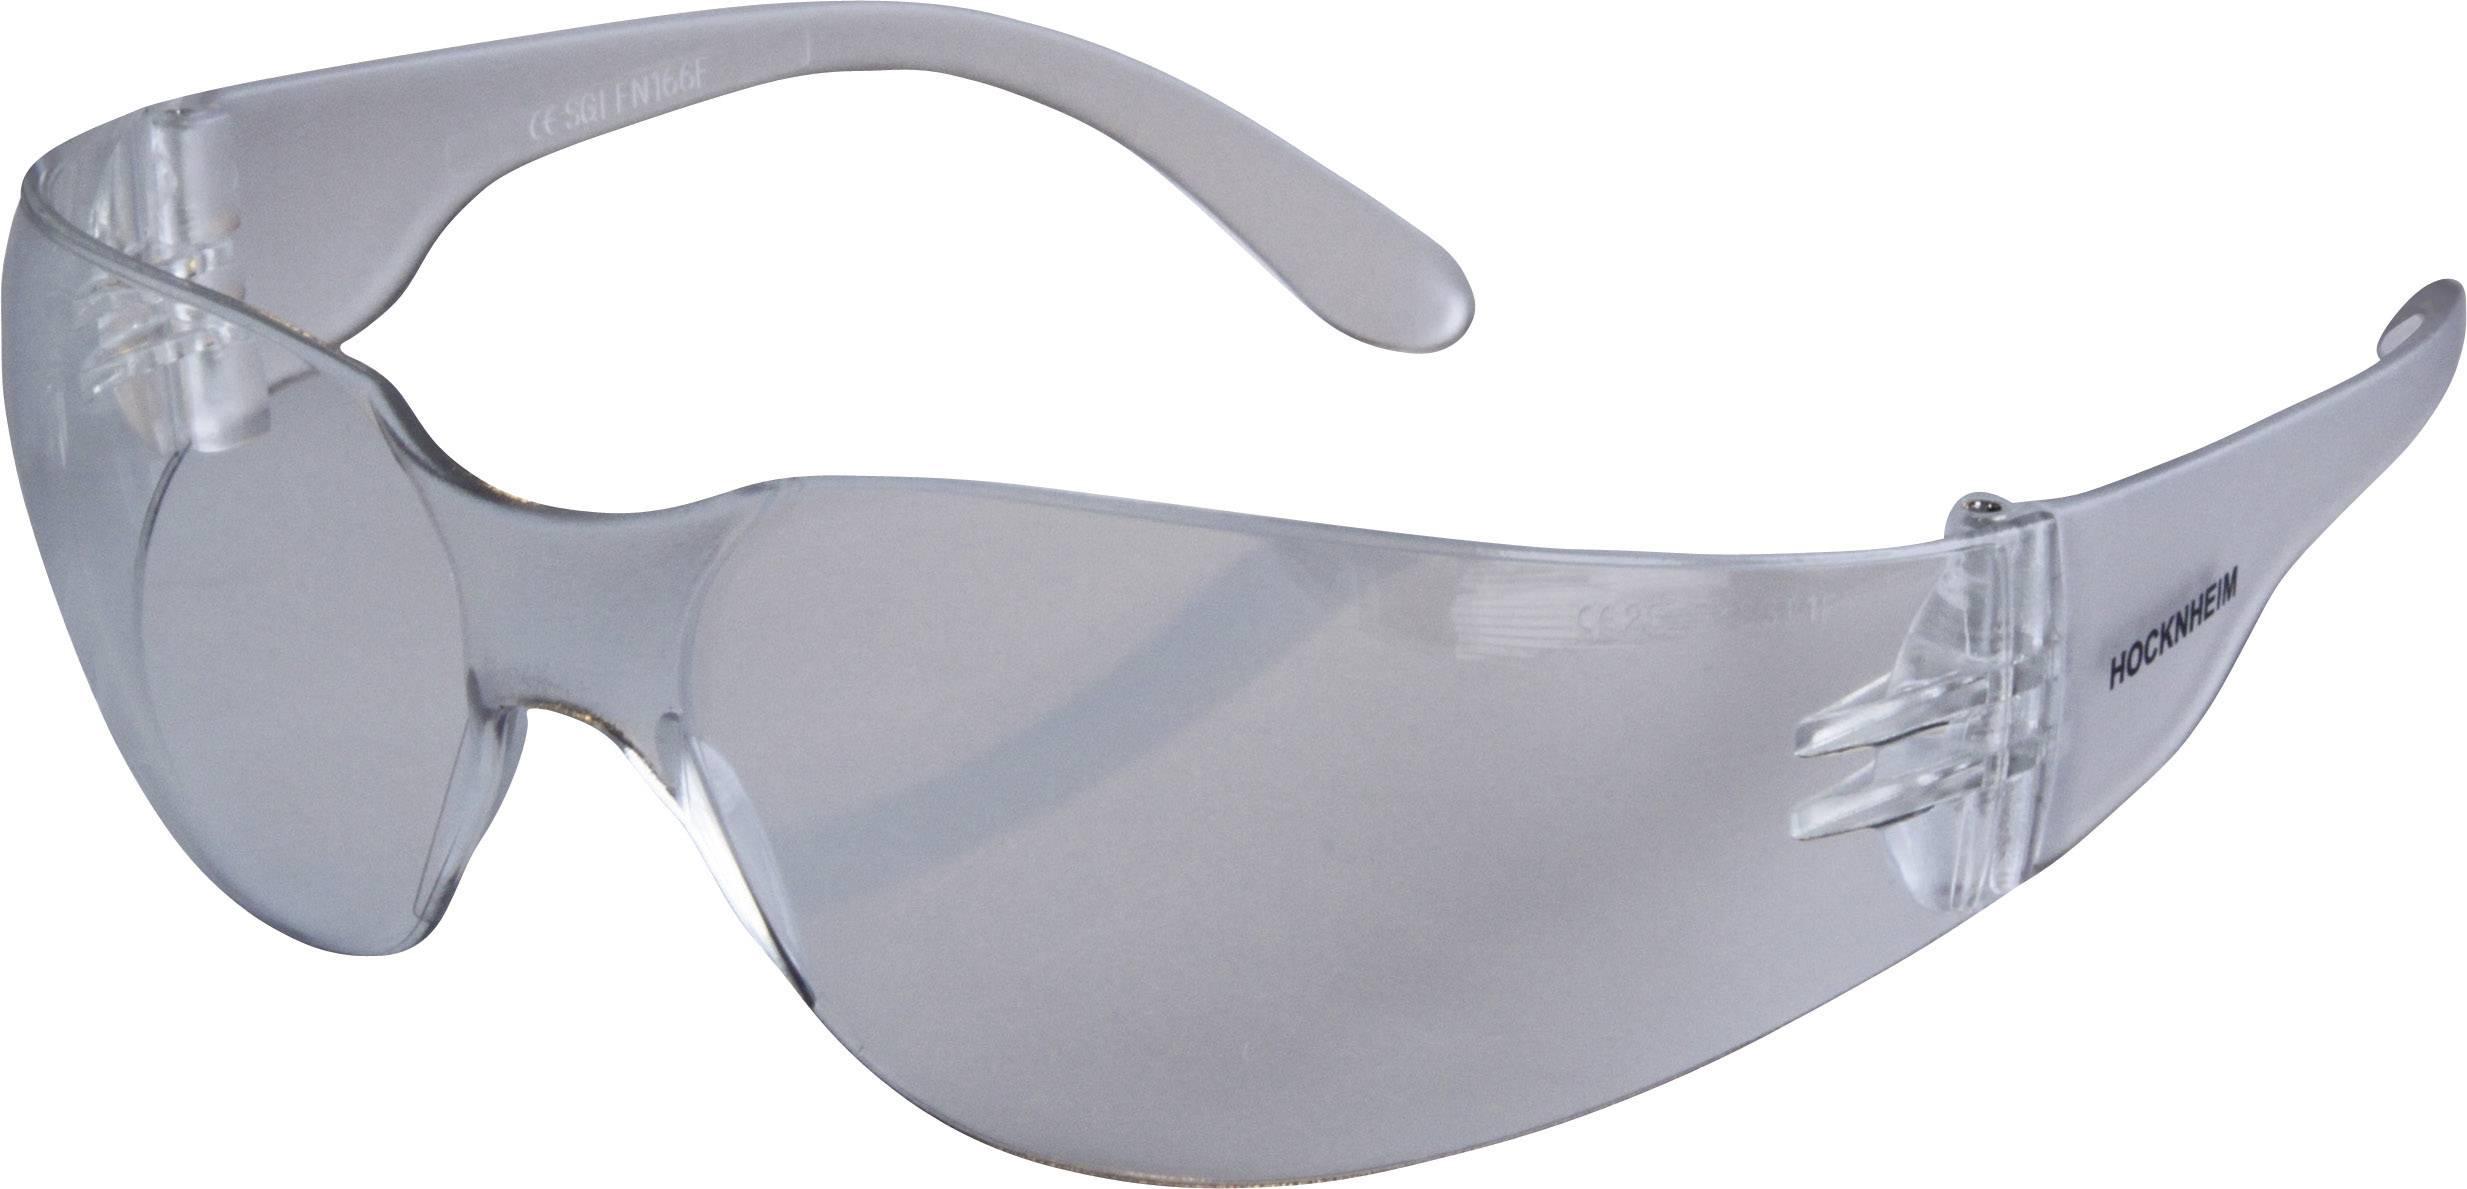 Ochranné okuliare protectionworld 2012001